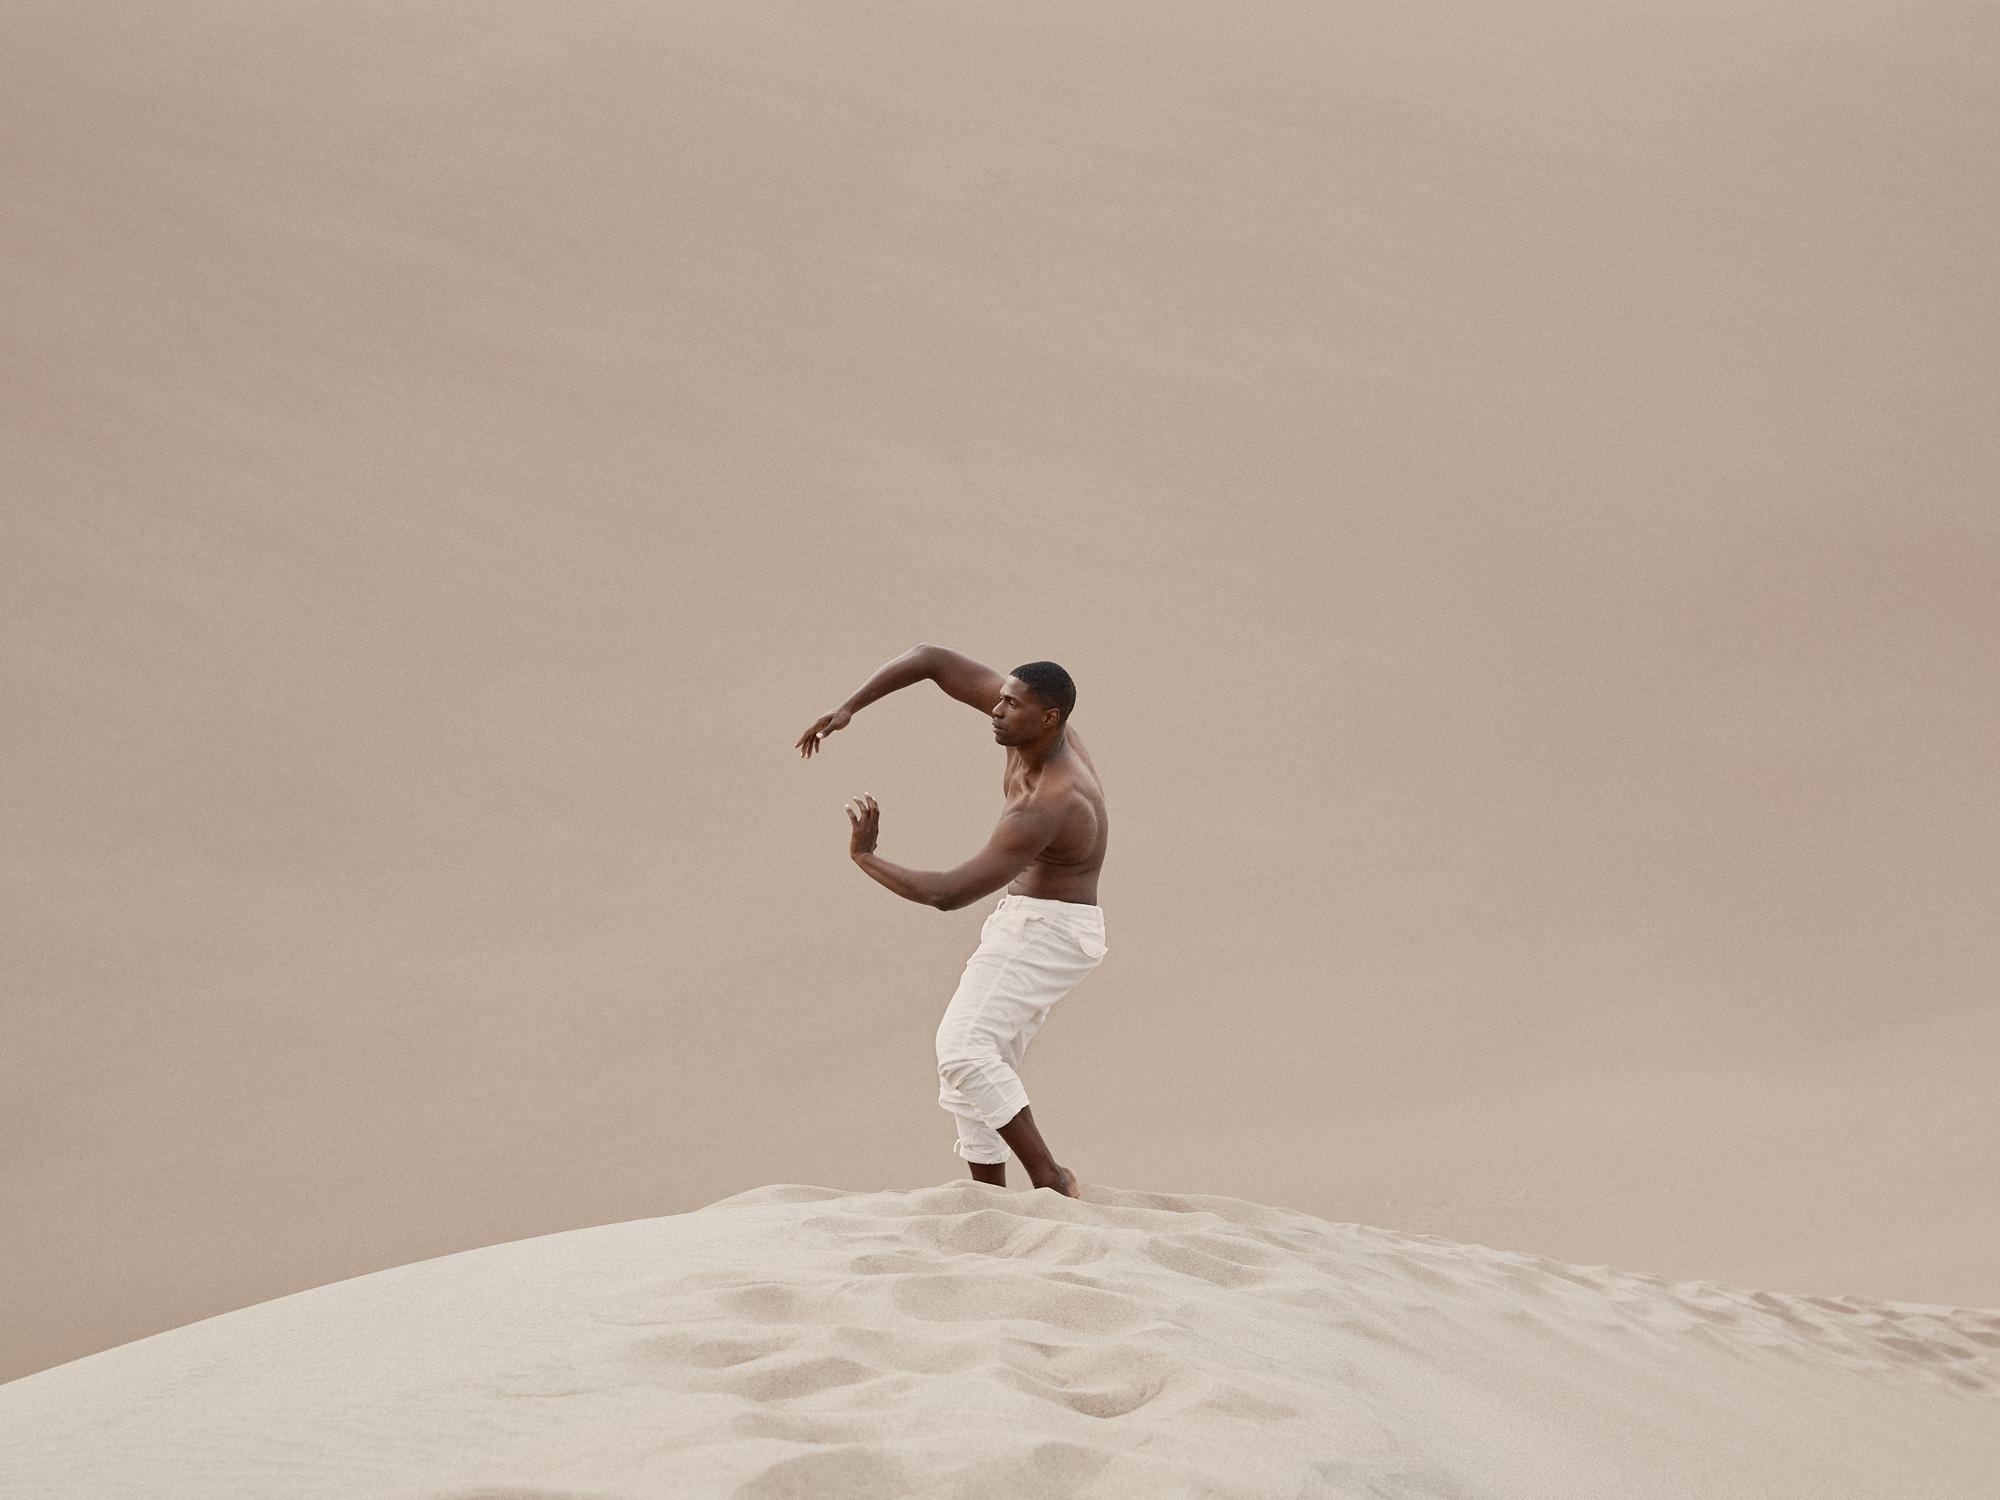 Dune-28.jpg